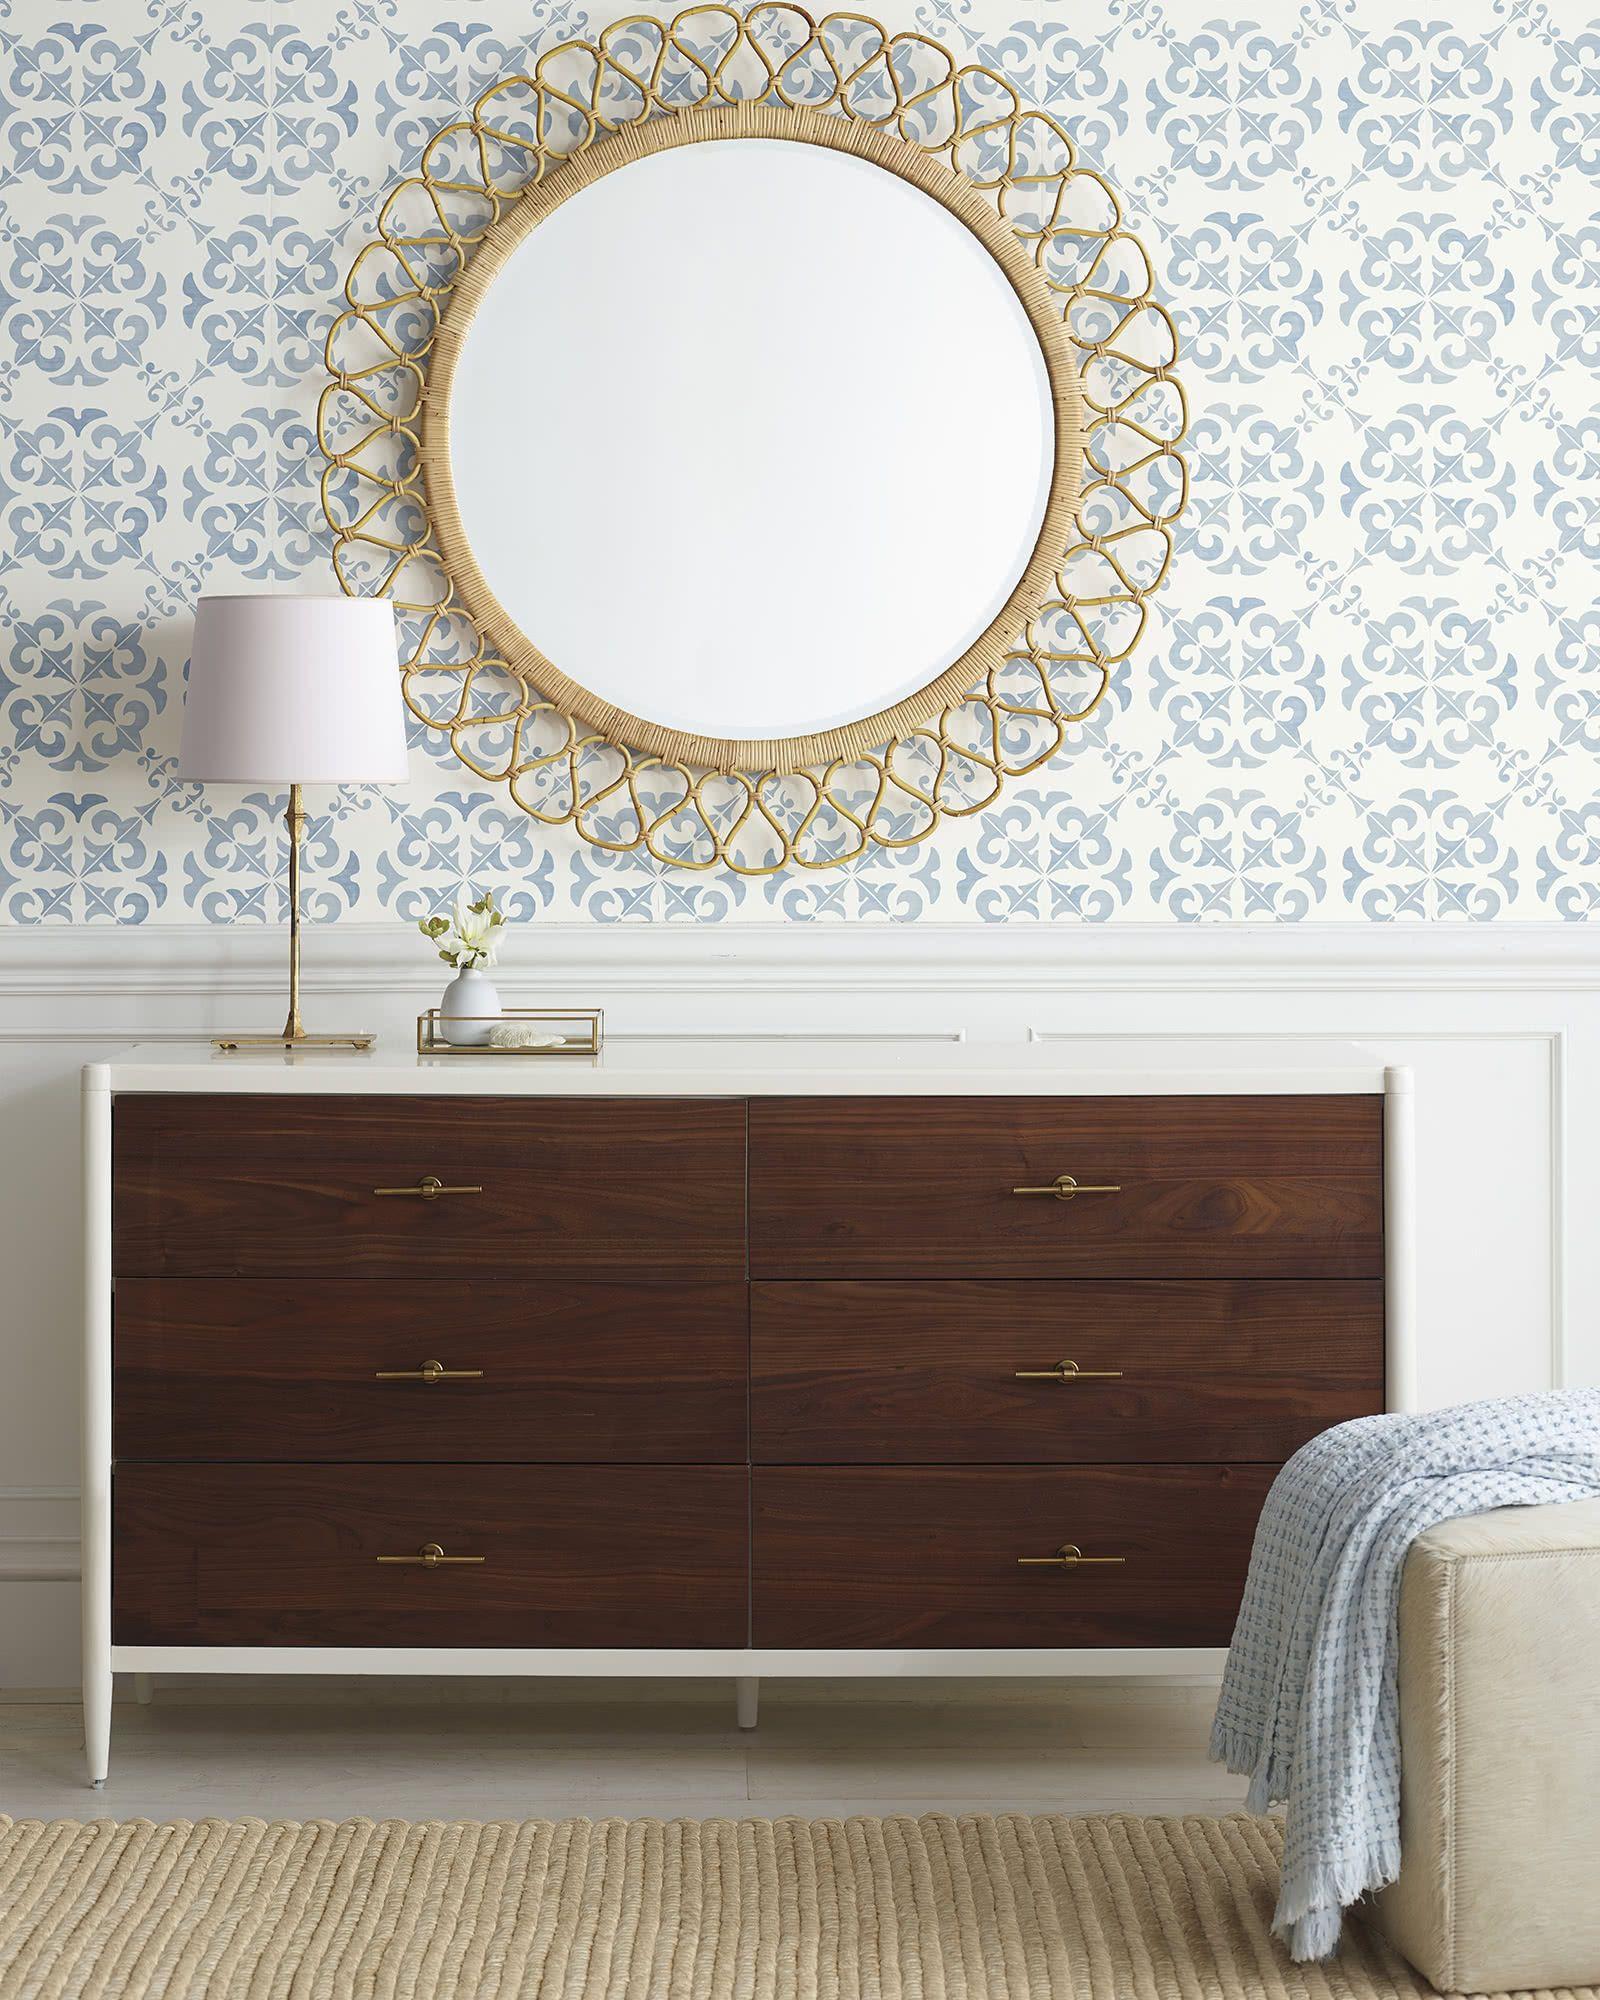 Wentworth Wallpaper Home Decor Bedroom Discount Bedroom Furniture Entry Furniture